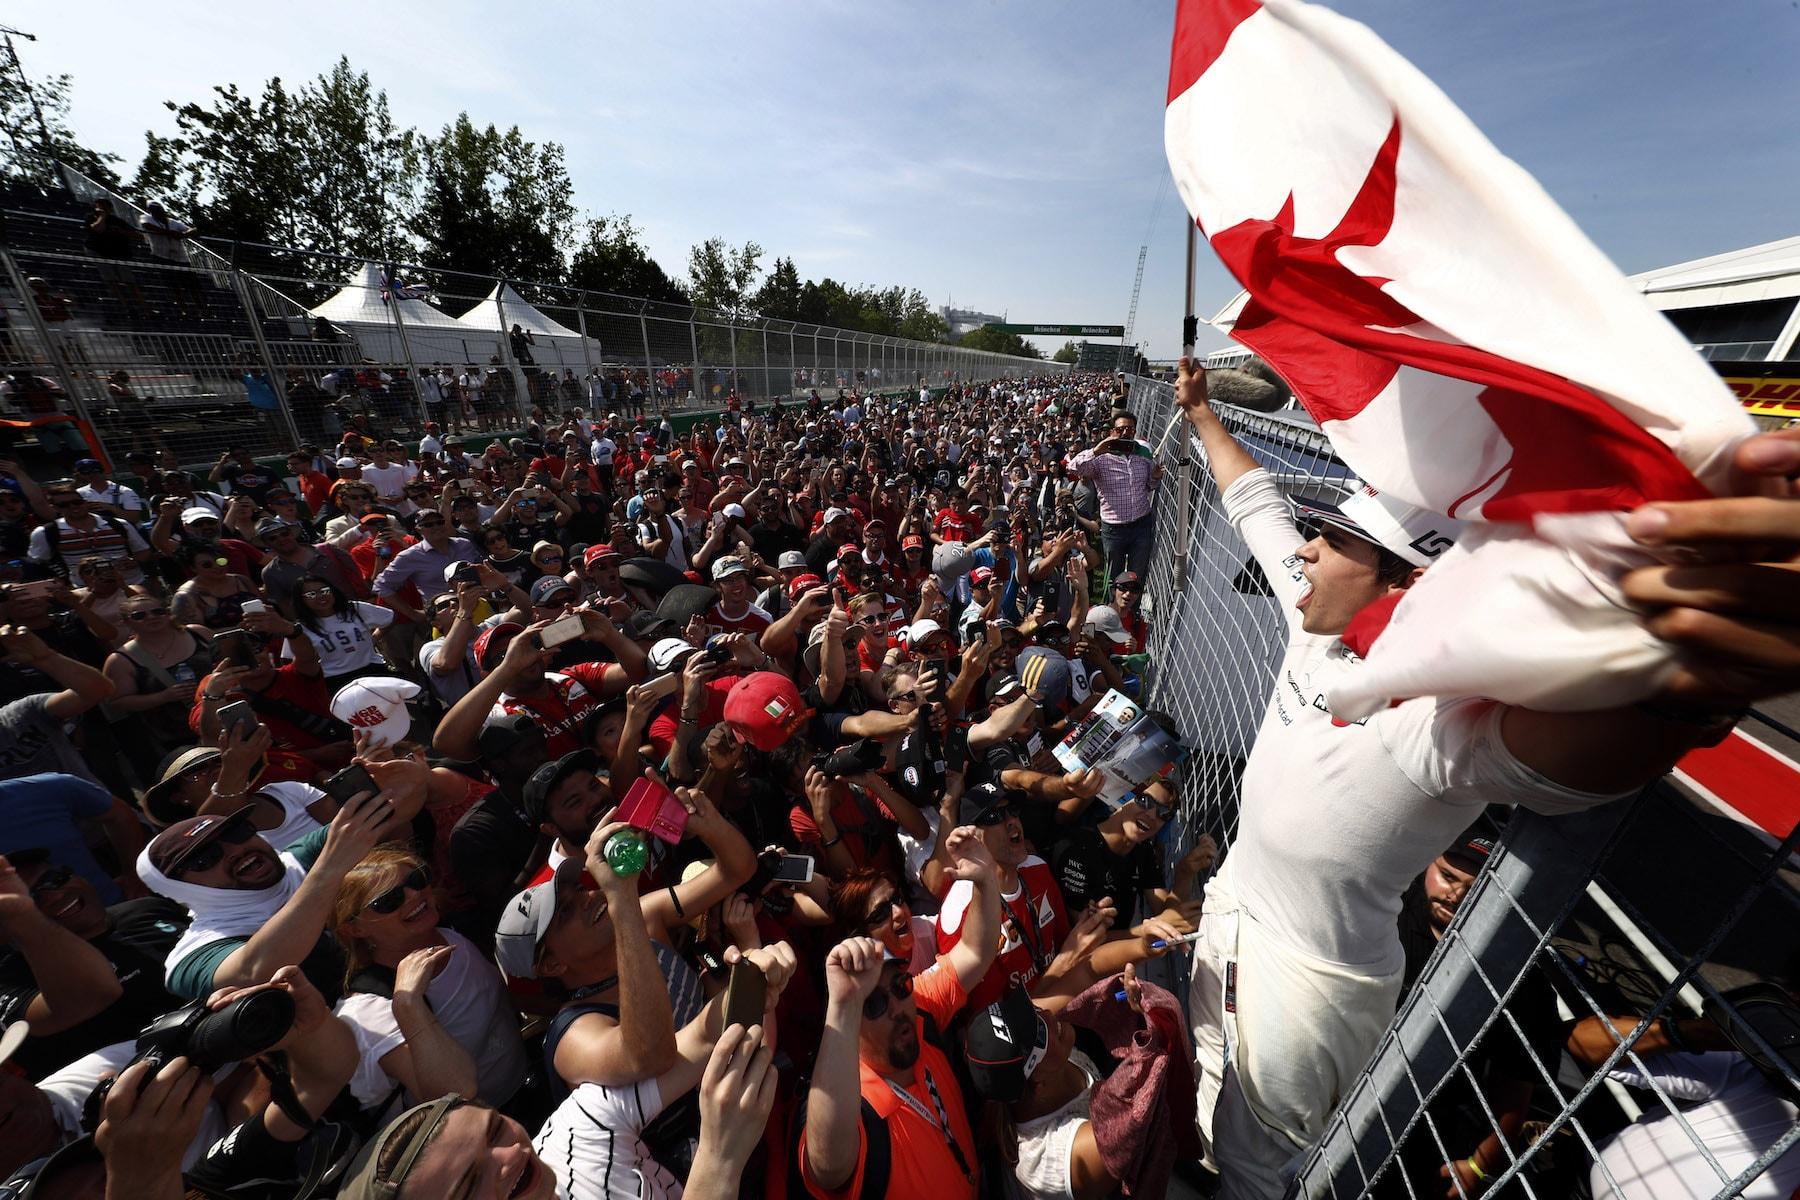 V 2017 Lance Stroll | williams FW40 | 2017 Canadian GP P9 3 copy.jpg